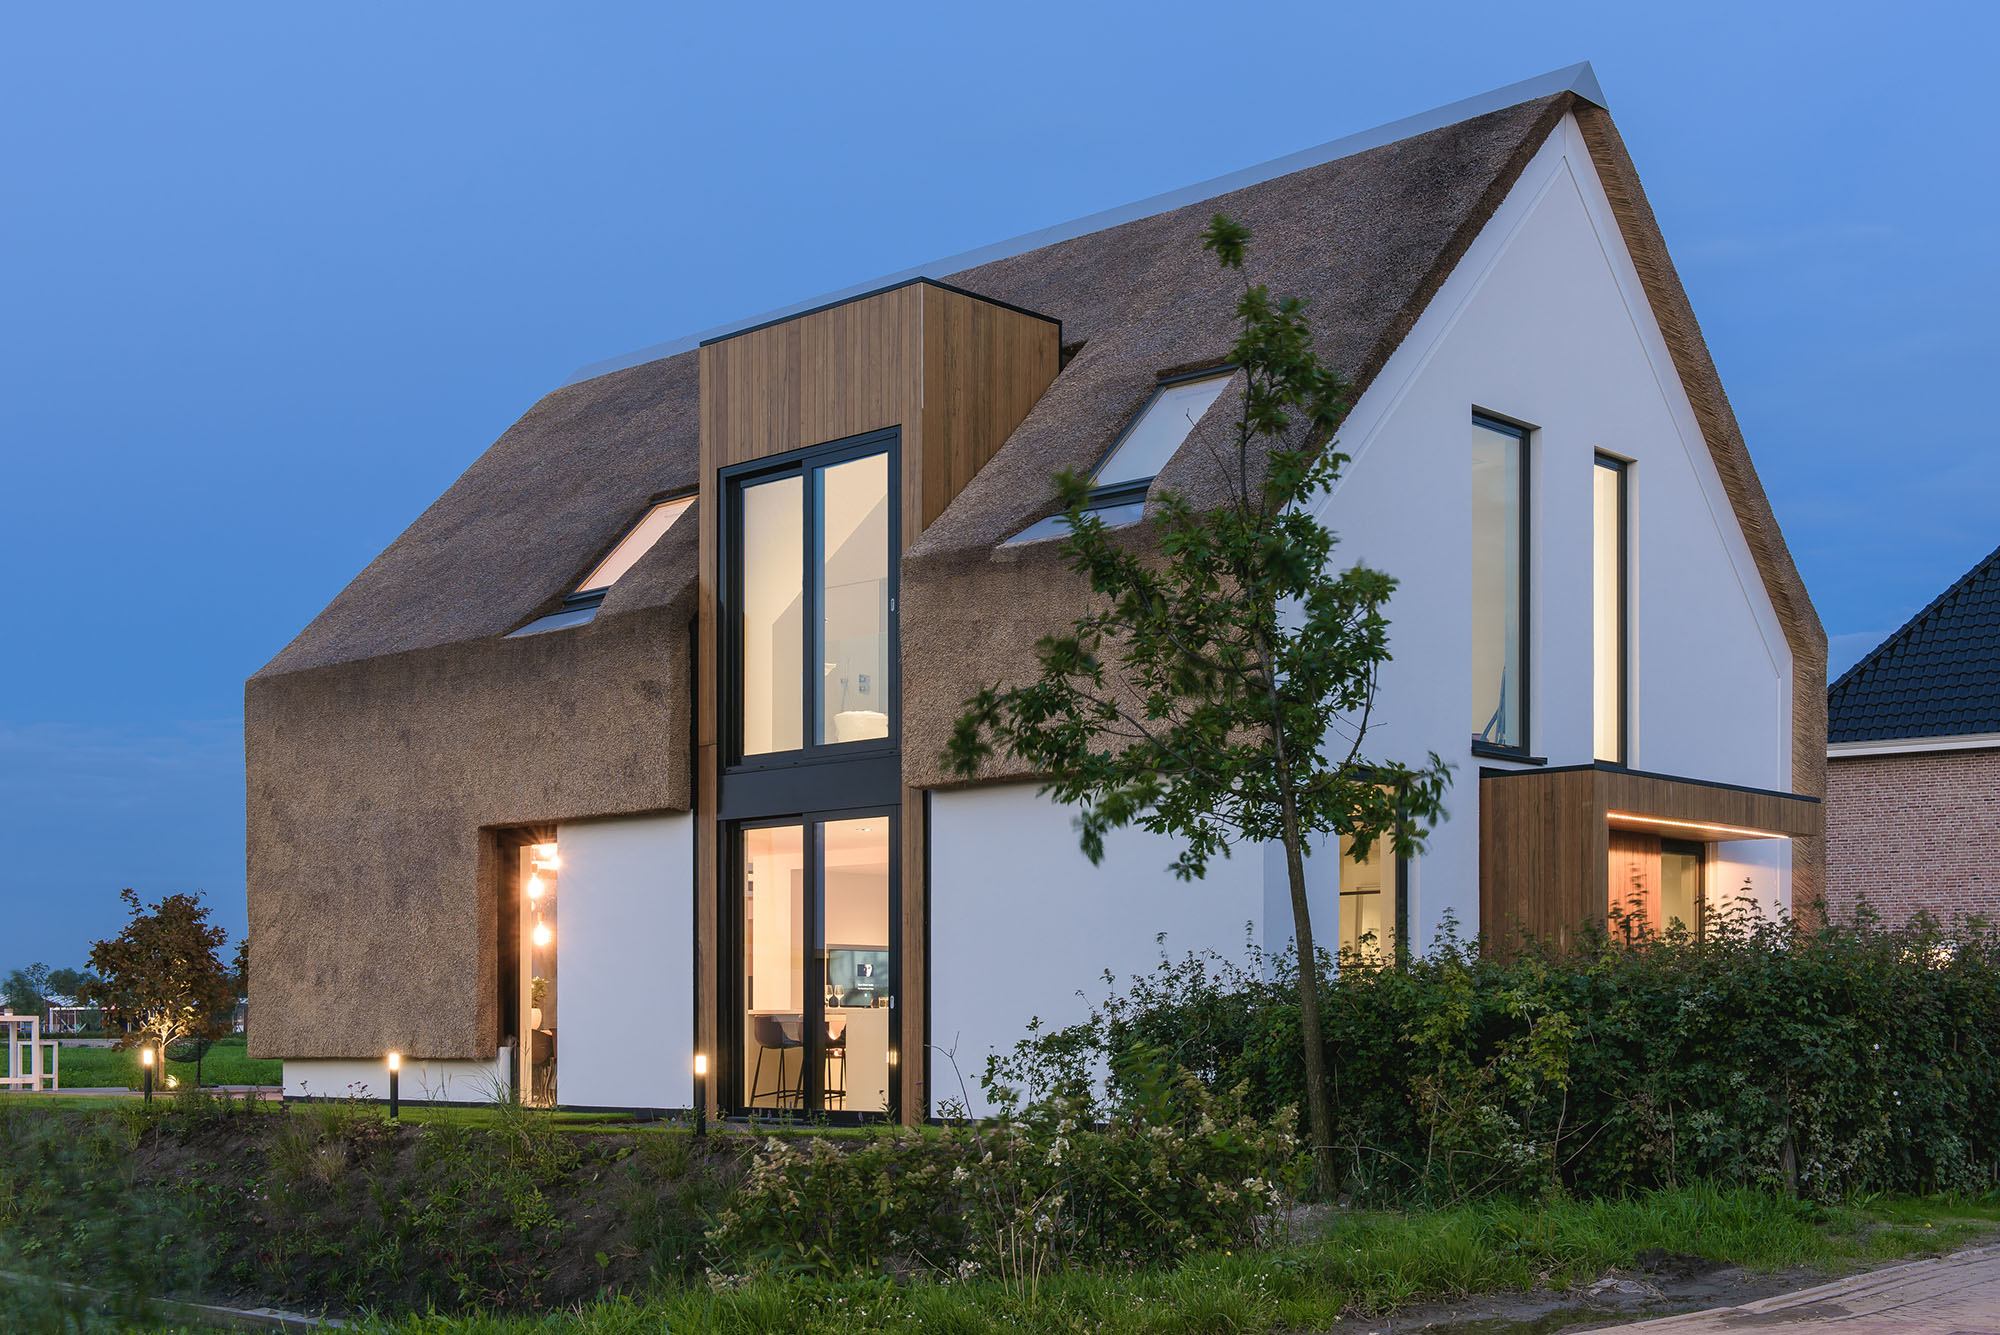 JURY-House008-rietendak-uitbouw-modern-07